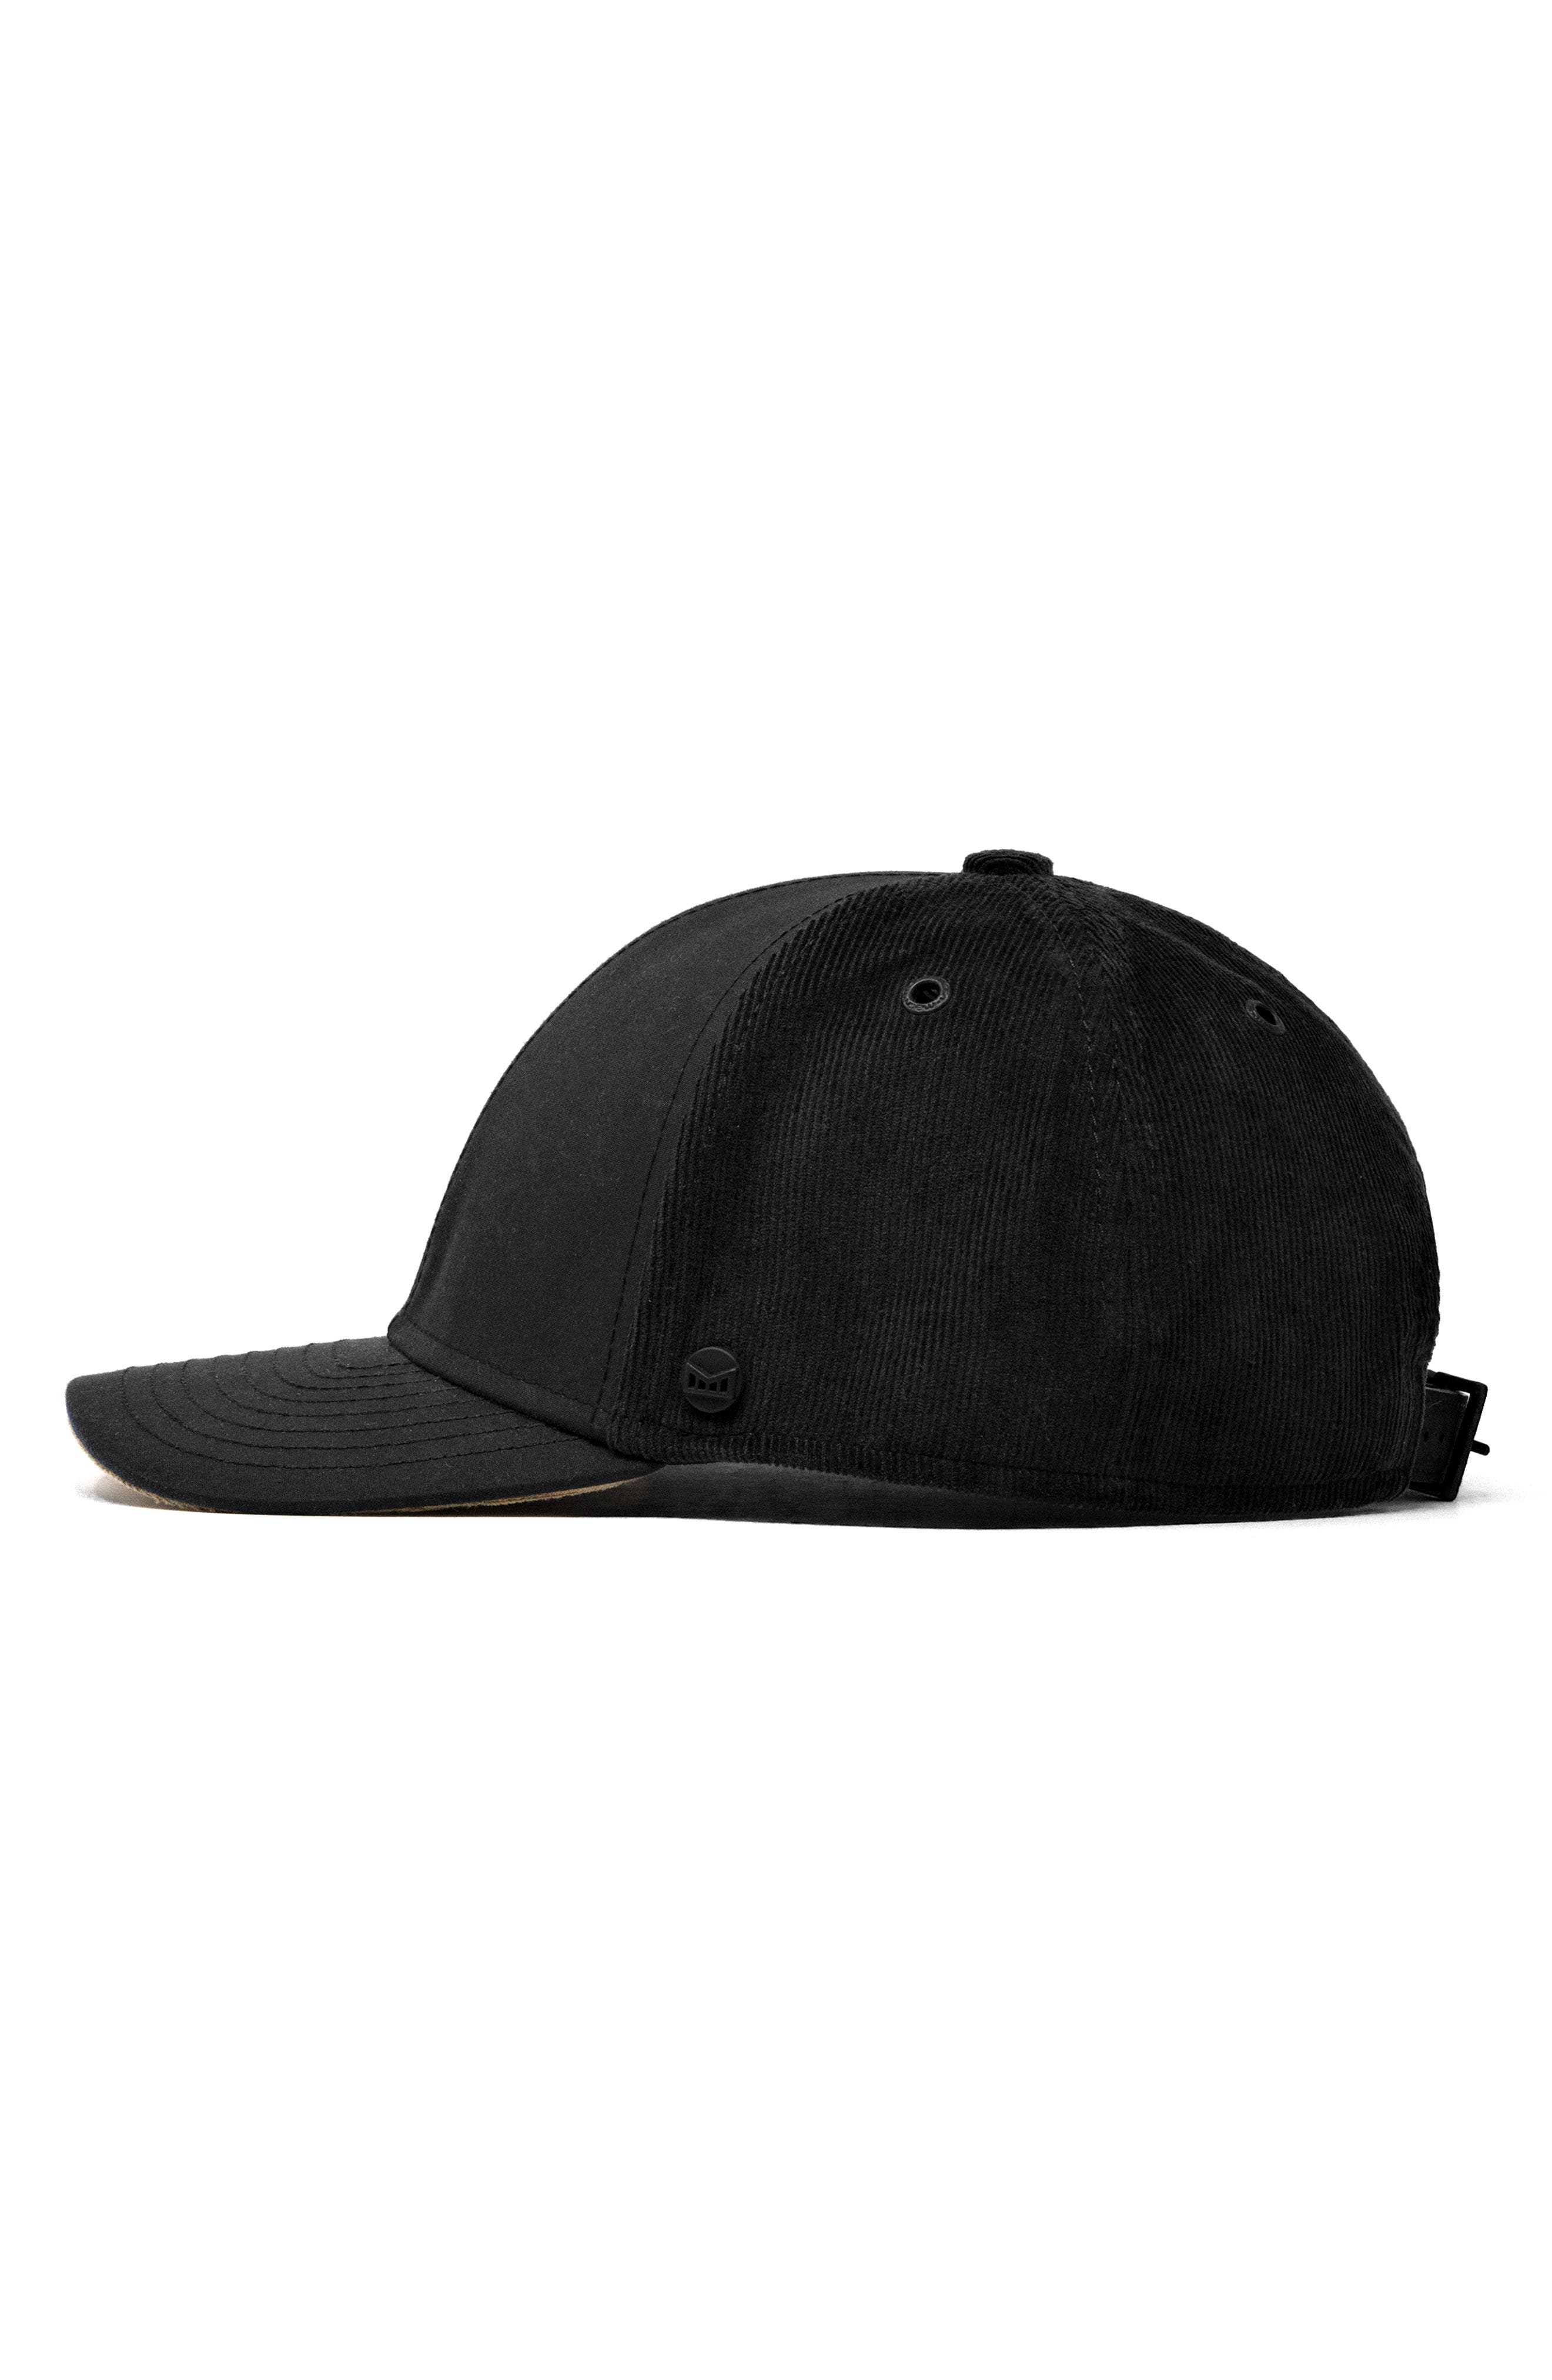 Discovery Baseball Cap,                             Alternate thumbnail 6, color,                             BLACK